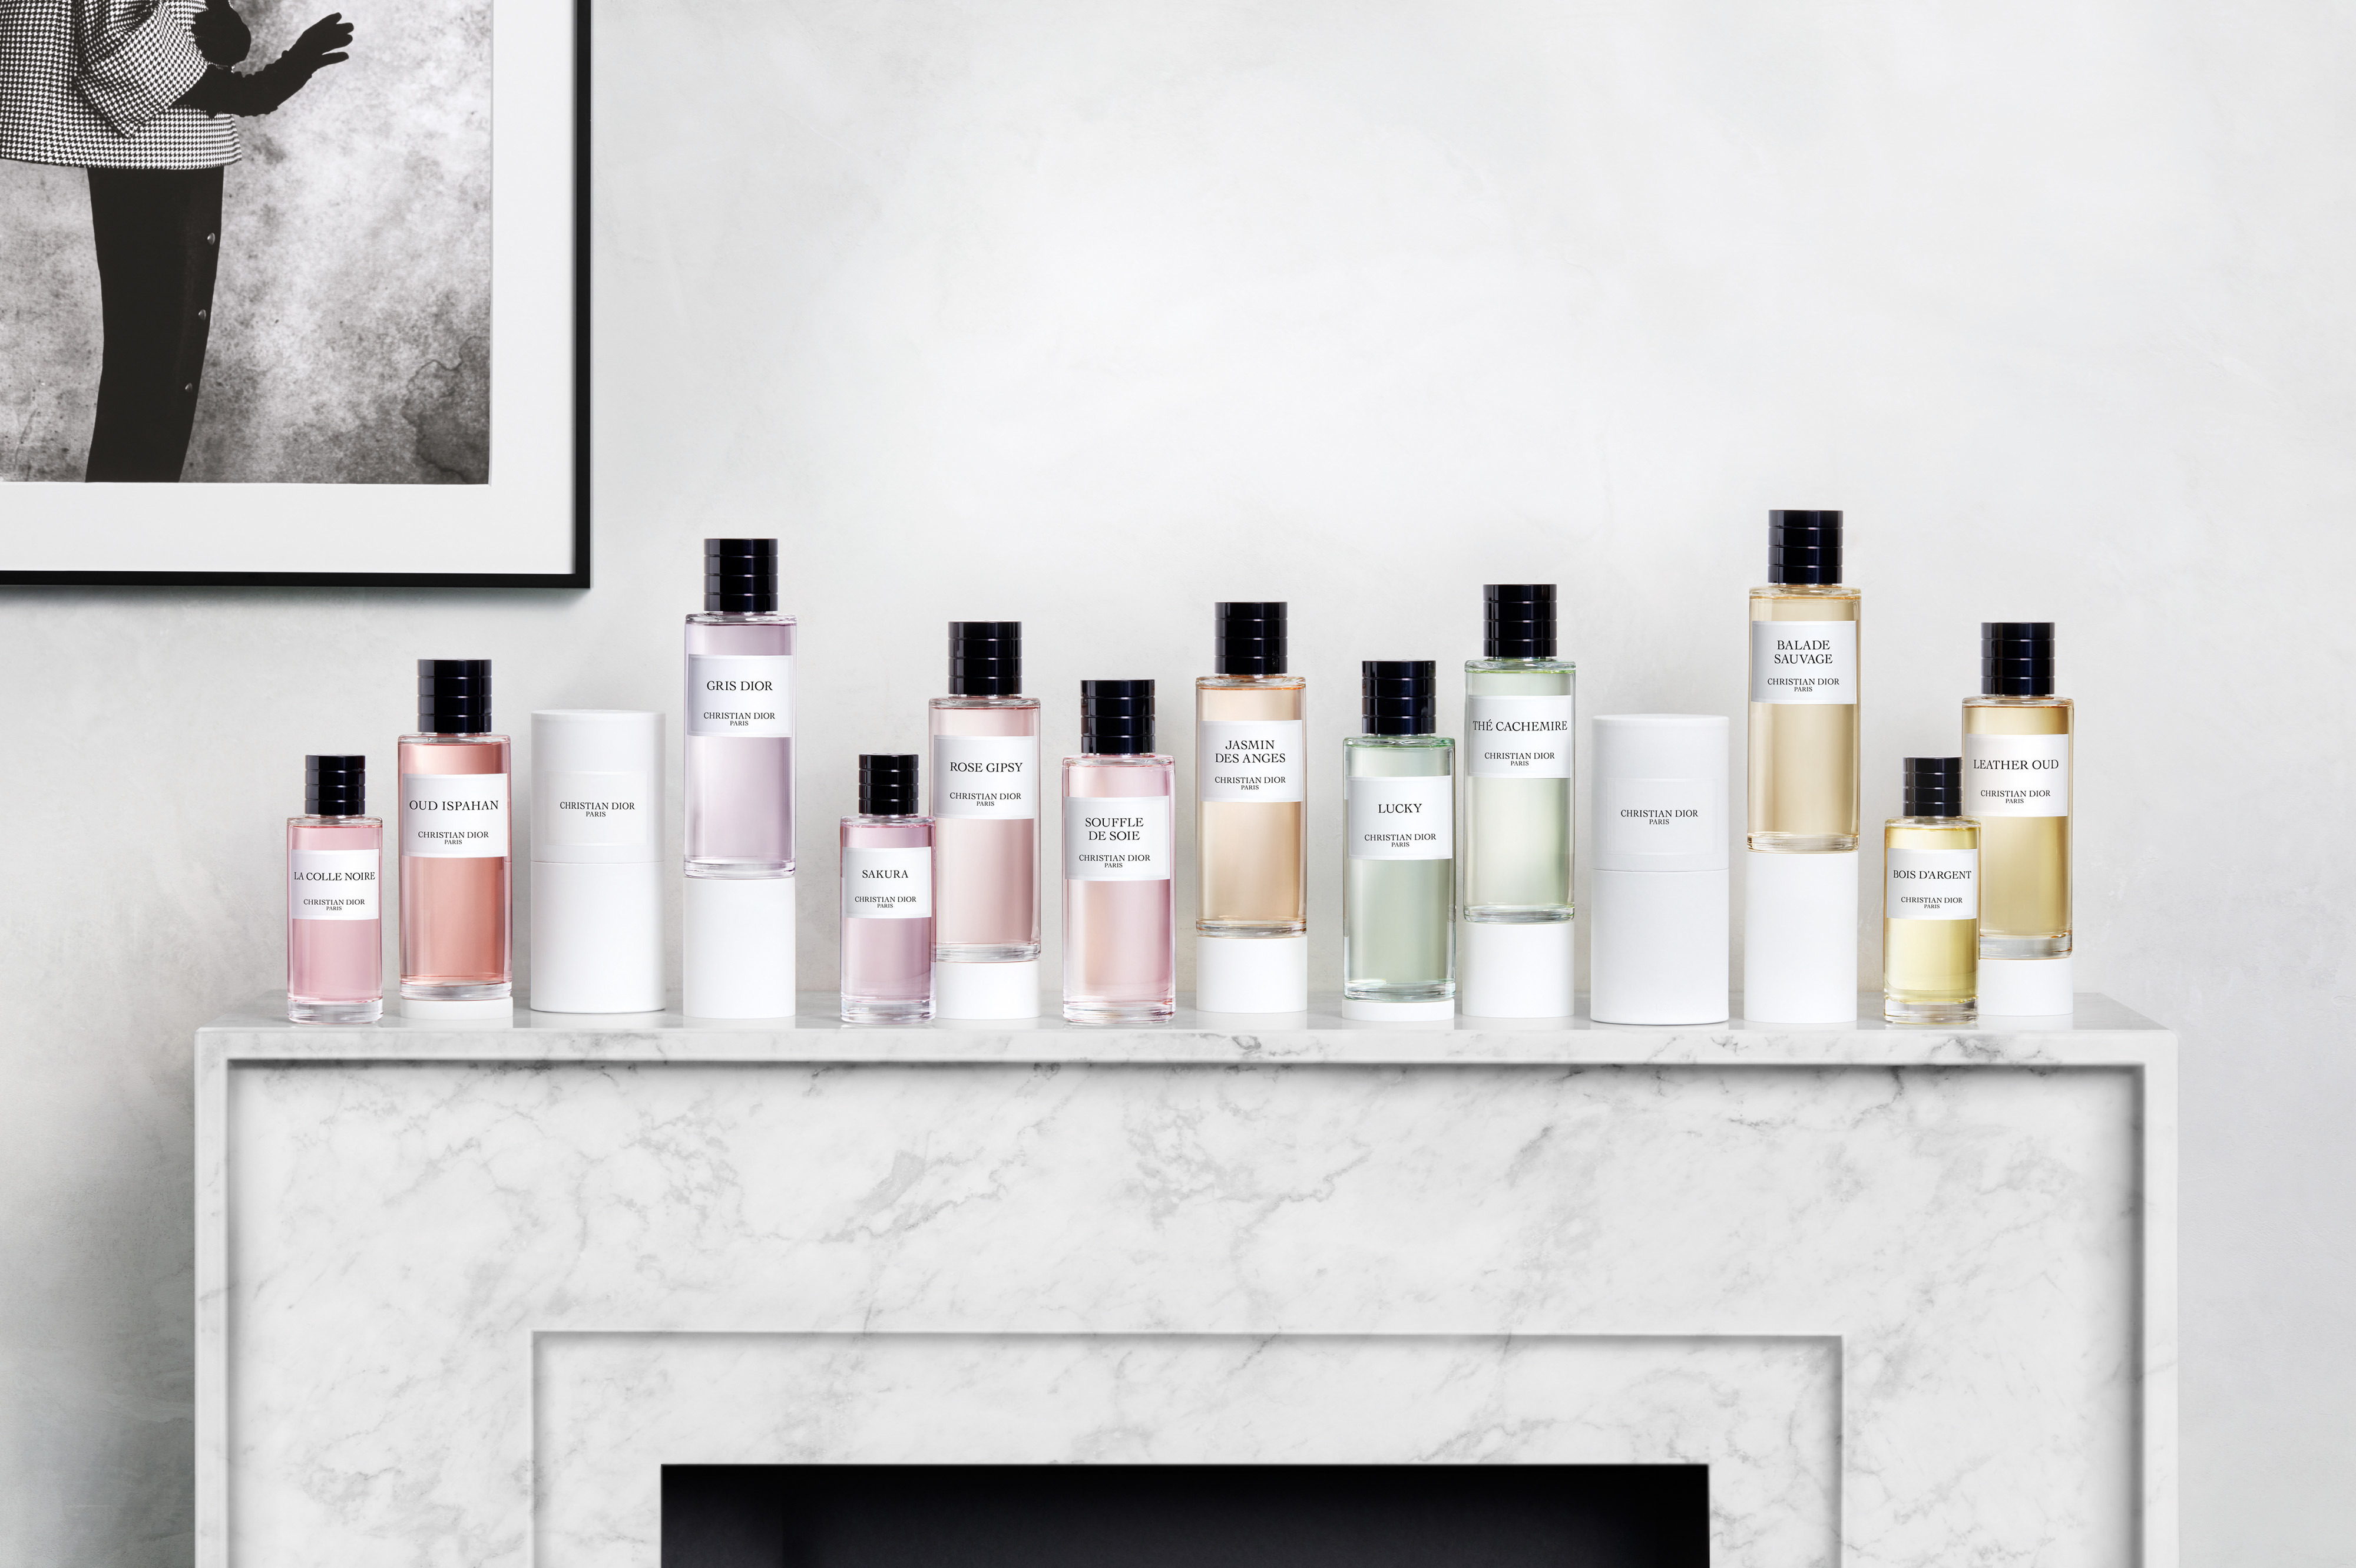 La Colle Noire Dior dior oud rosewood ~ new fragrances